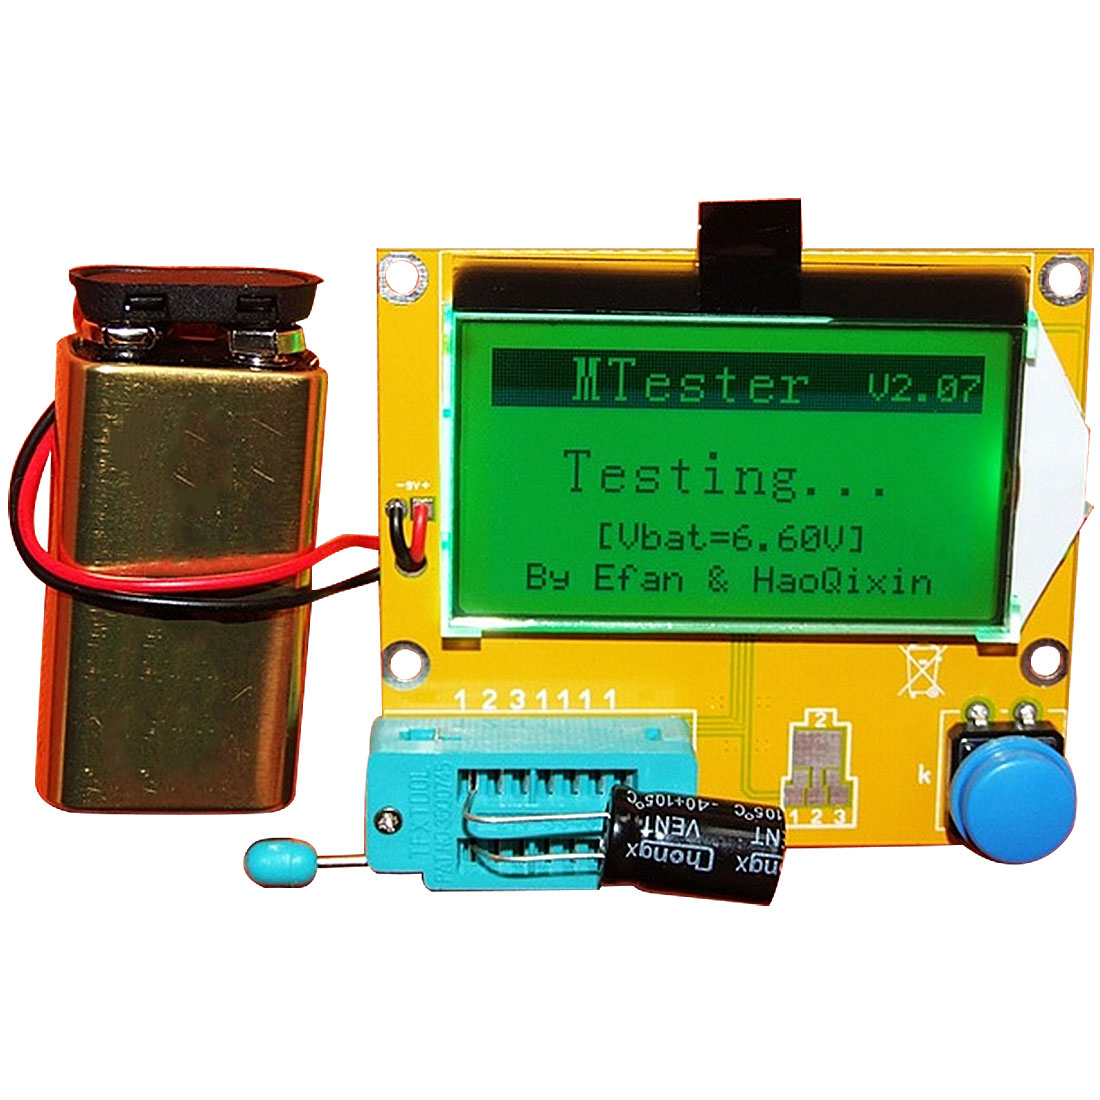 LCR-T4 LCD ดิจิตอลทรานซิสเตอร์ Tester Meter Backlight Diode Triode  Capacitance ESR Meter สำหรับ MOSFET